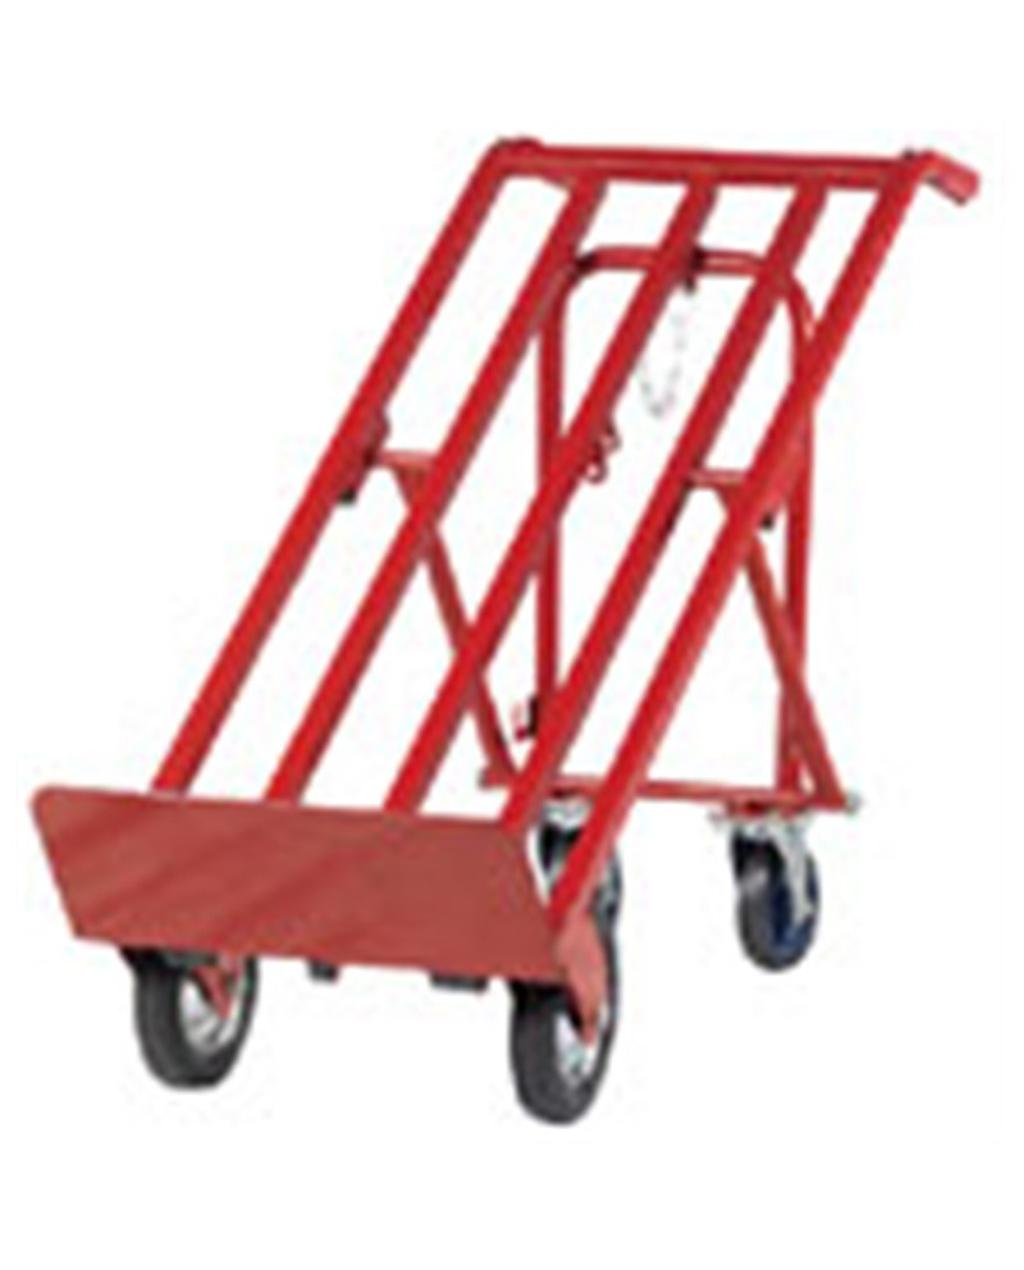 3 Position Truck - 300kg Capacity